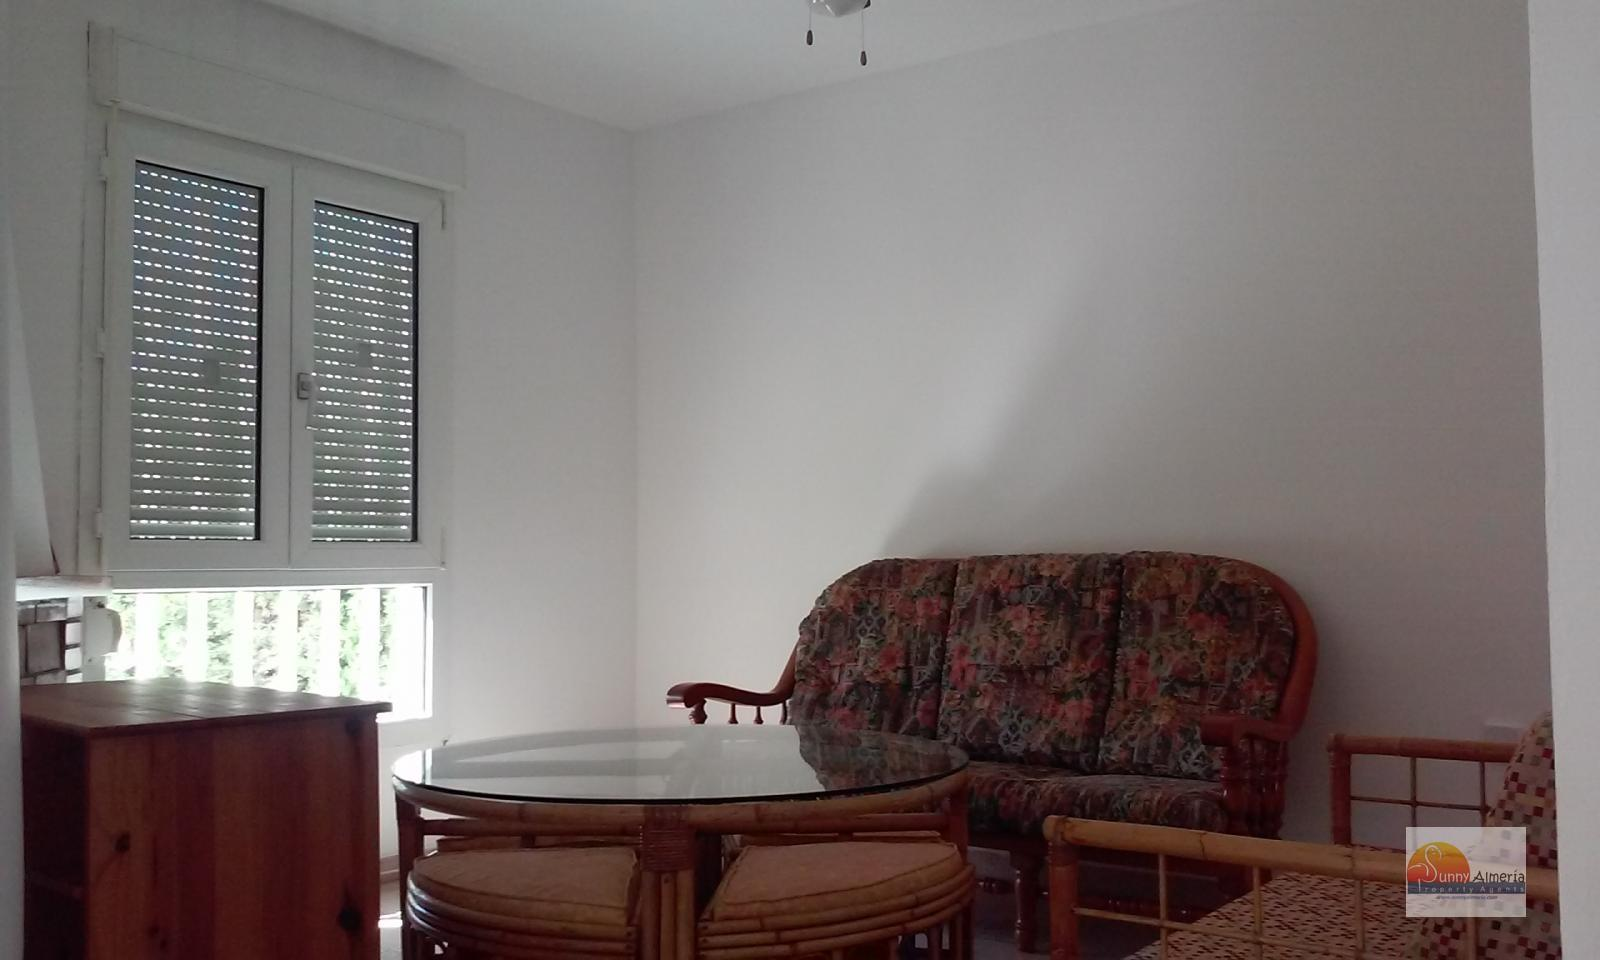 Duplex for sale in Roquetas de Mar, 186.000 €